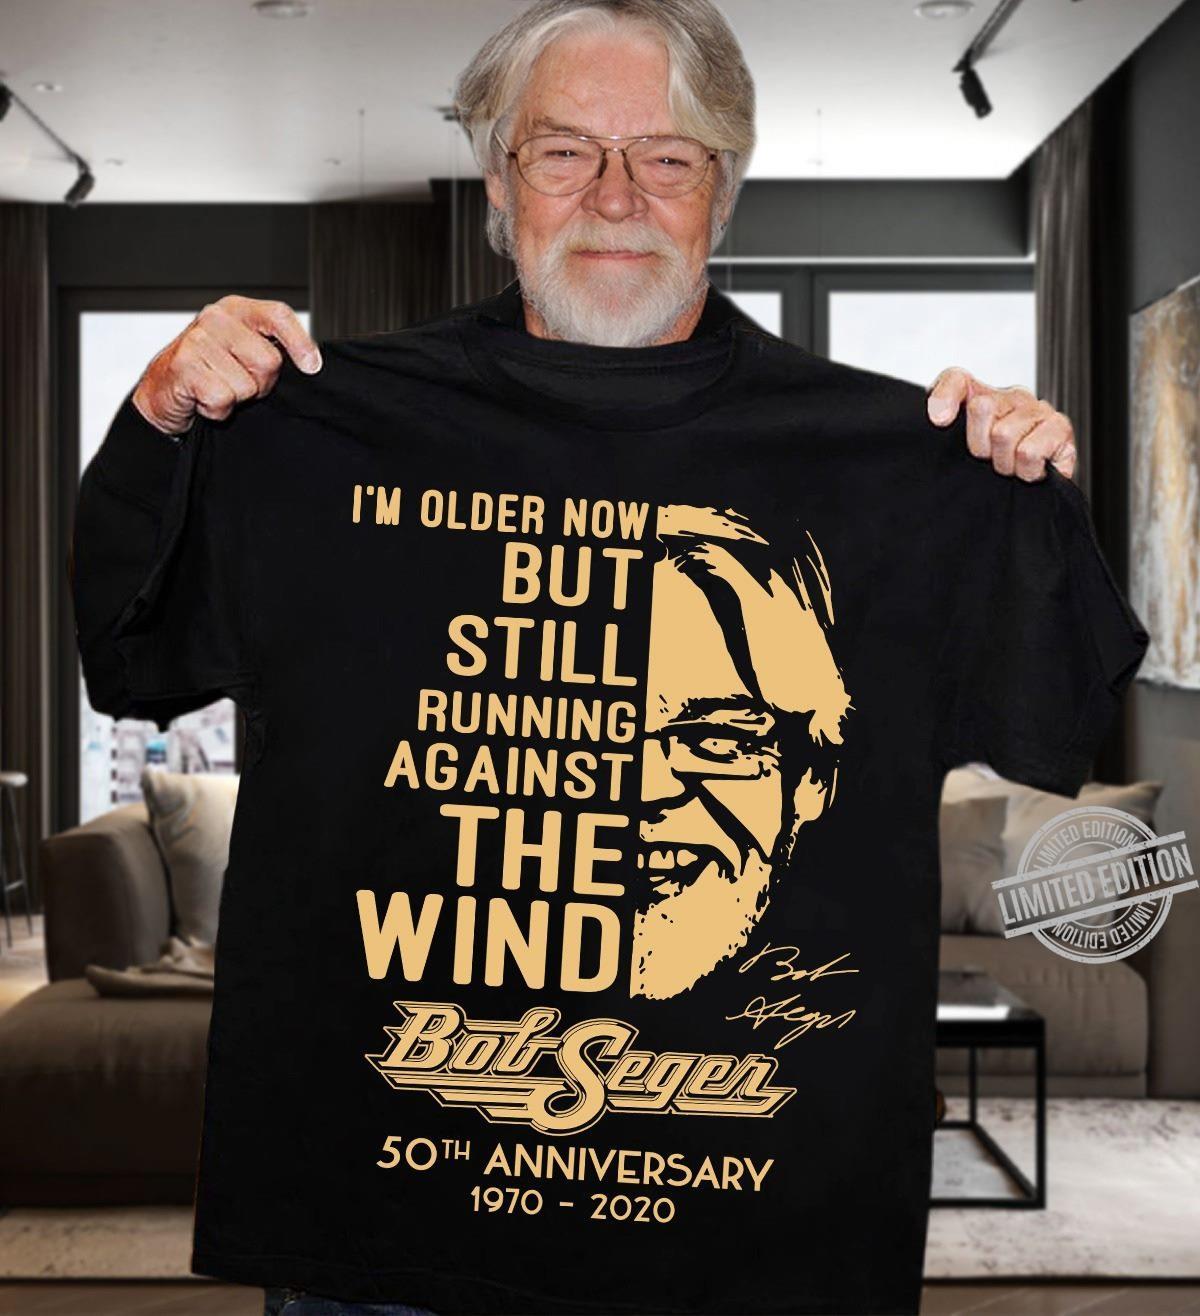 I'm Older Now But Still Running Against Wind Bod Segen 50th Anniversary 1970-2020 Shirt